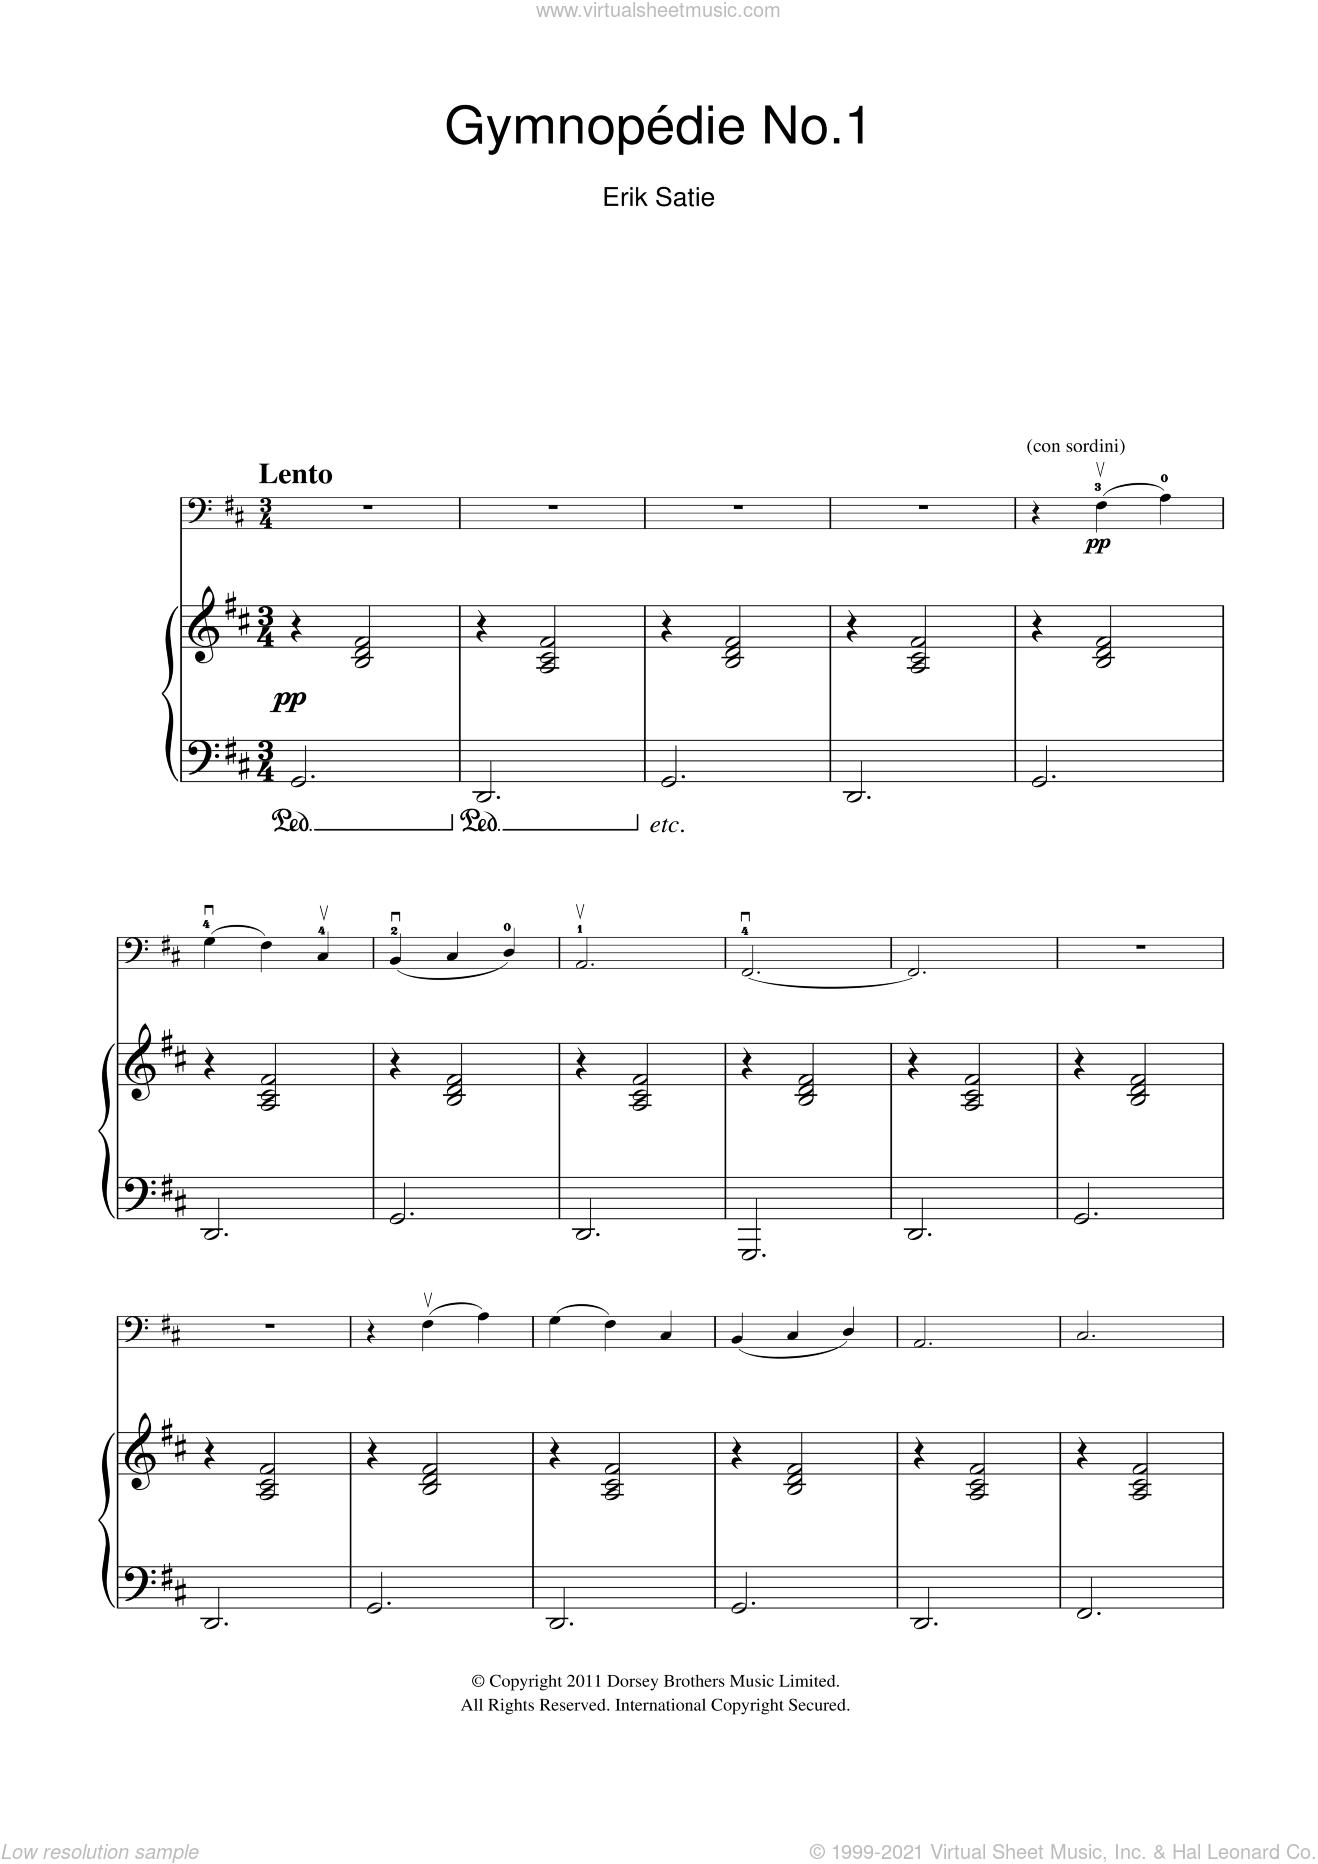 Gymnopedie No. 1 sheet music for cello solo by Erik Satie, classical score, intermediate skill level